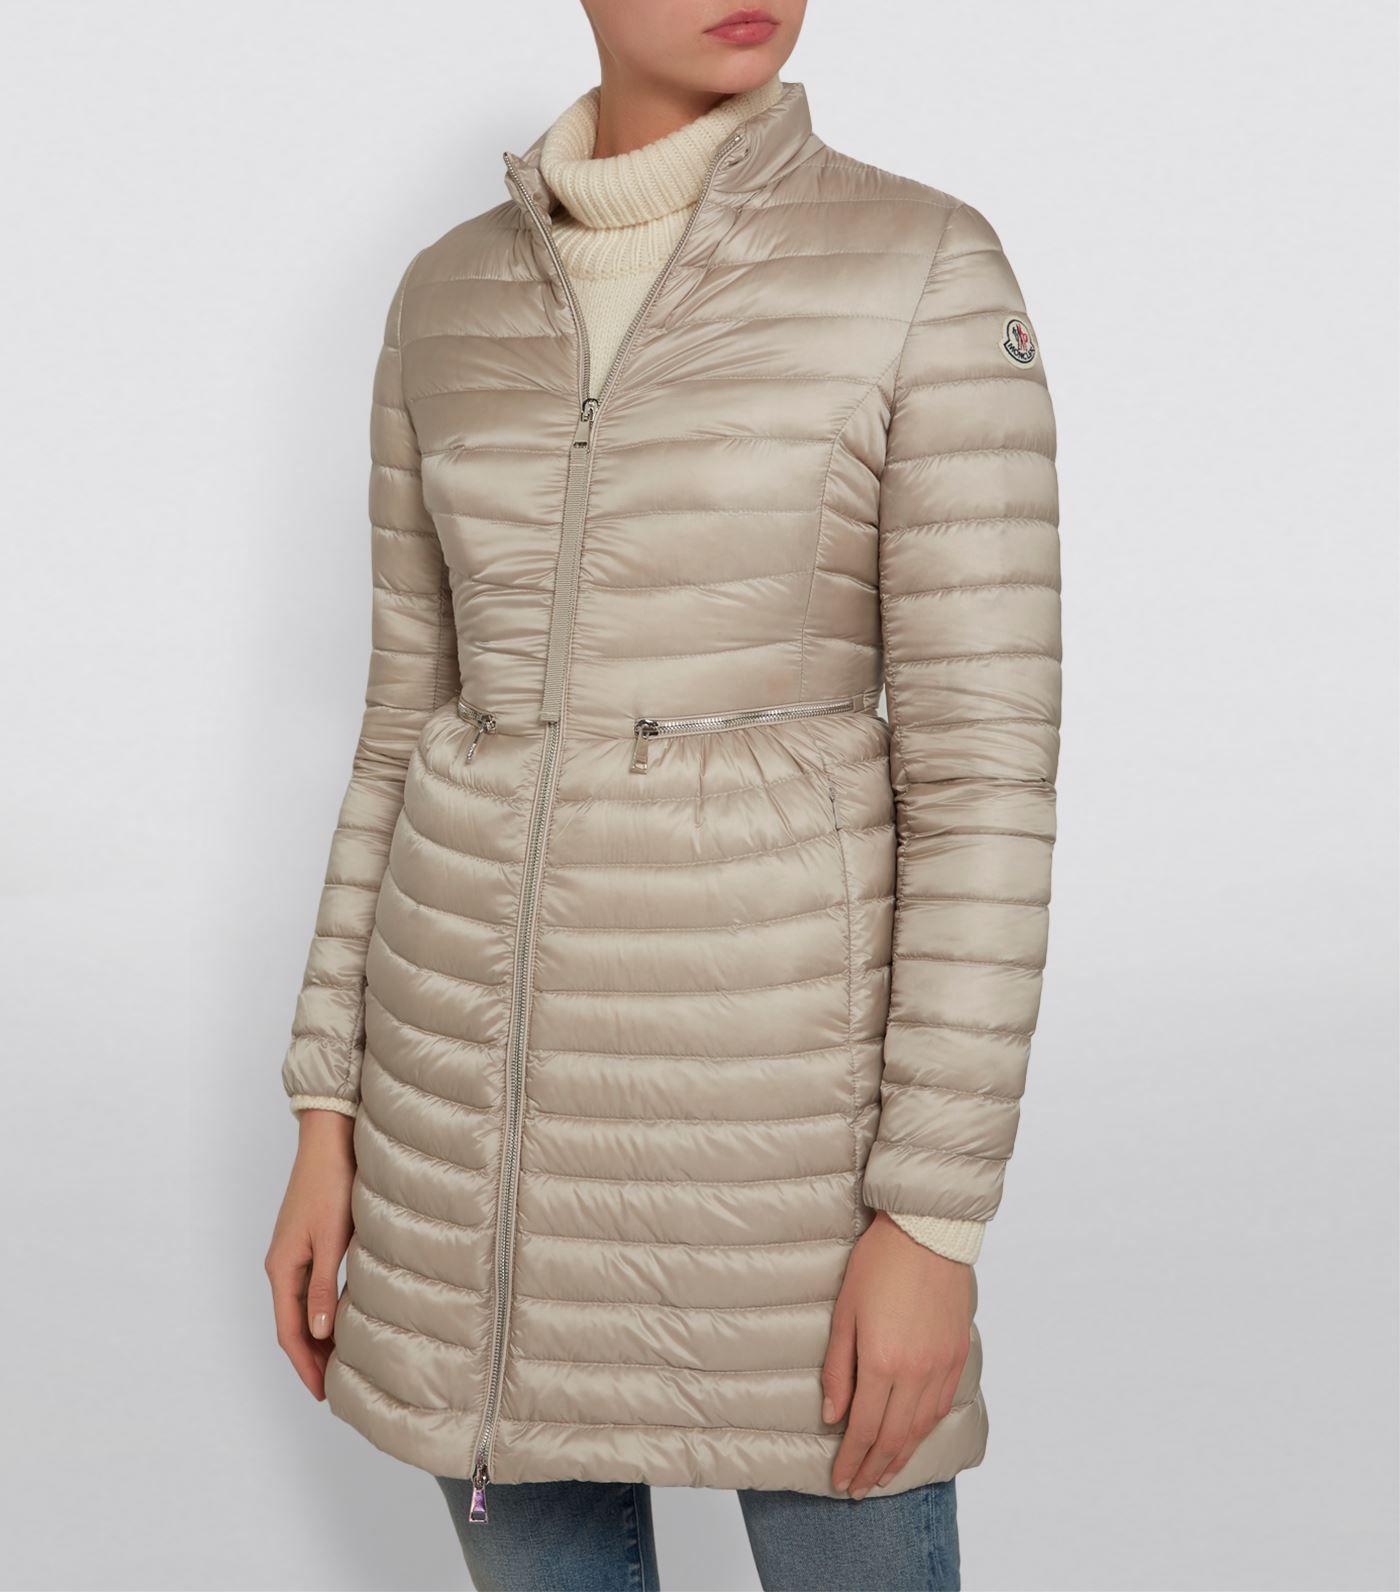 b9a961884 Agatelon Padded Down Jacket | Christmas Sweaters | Winter jackets ...